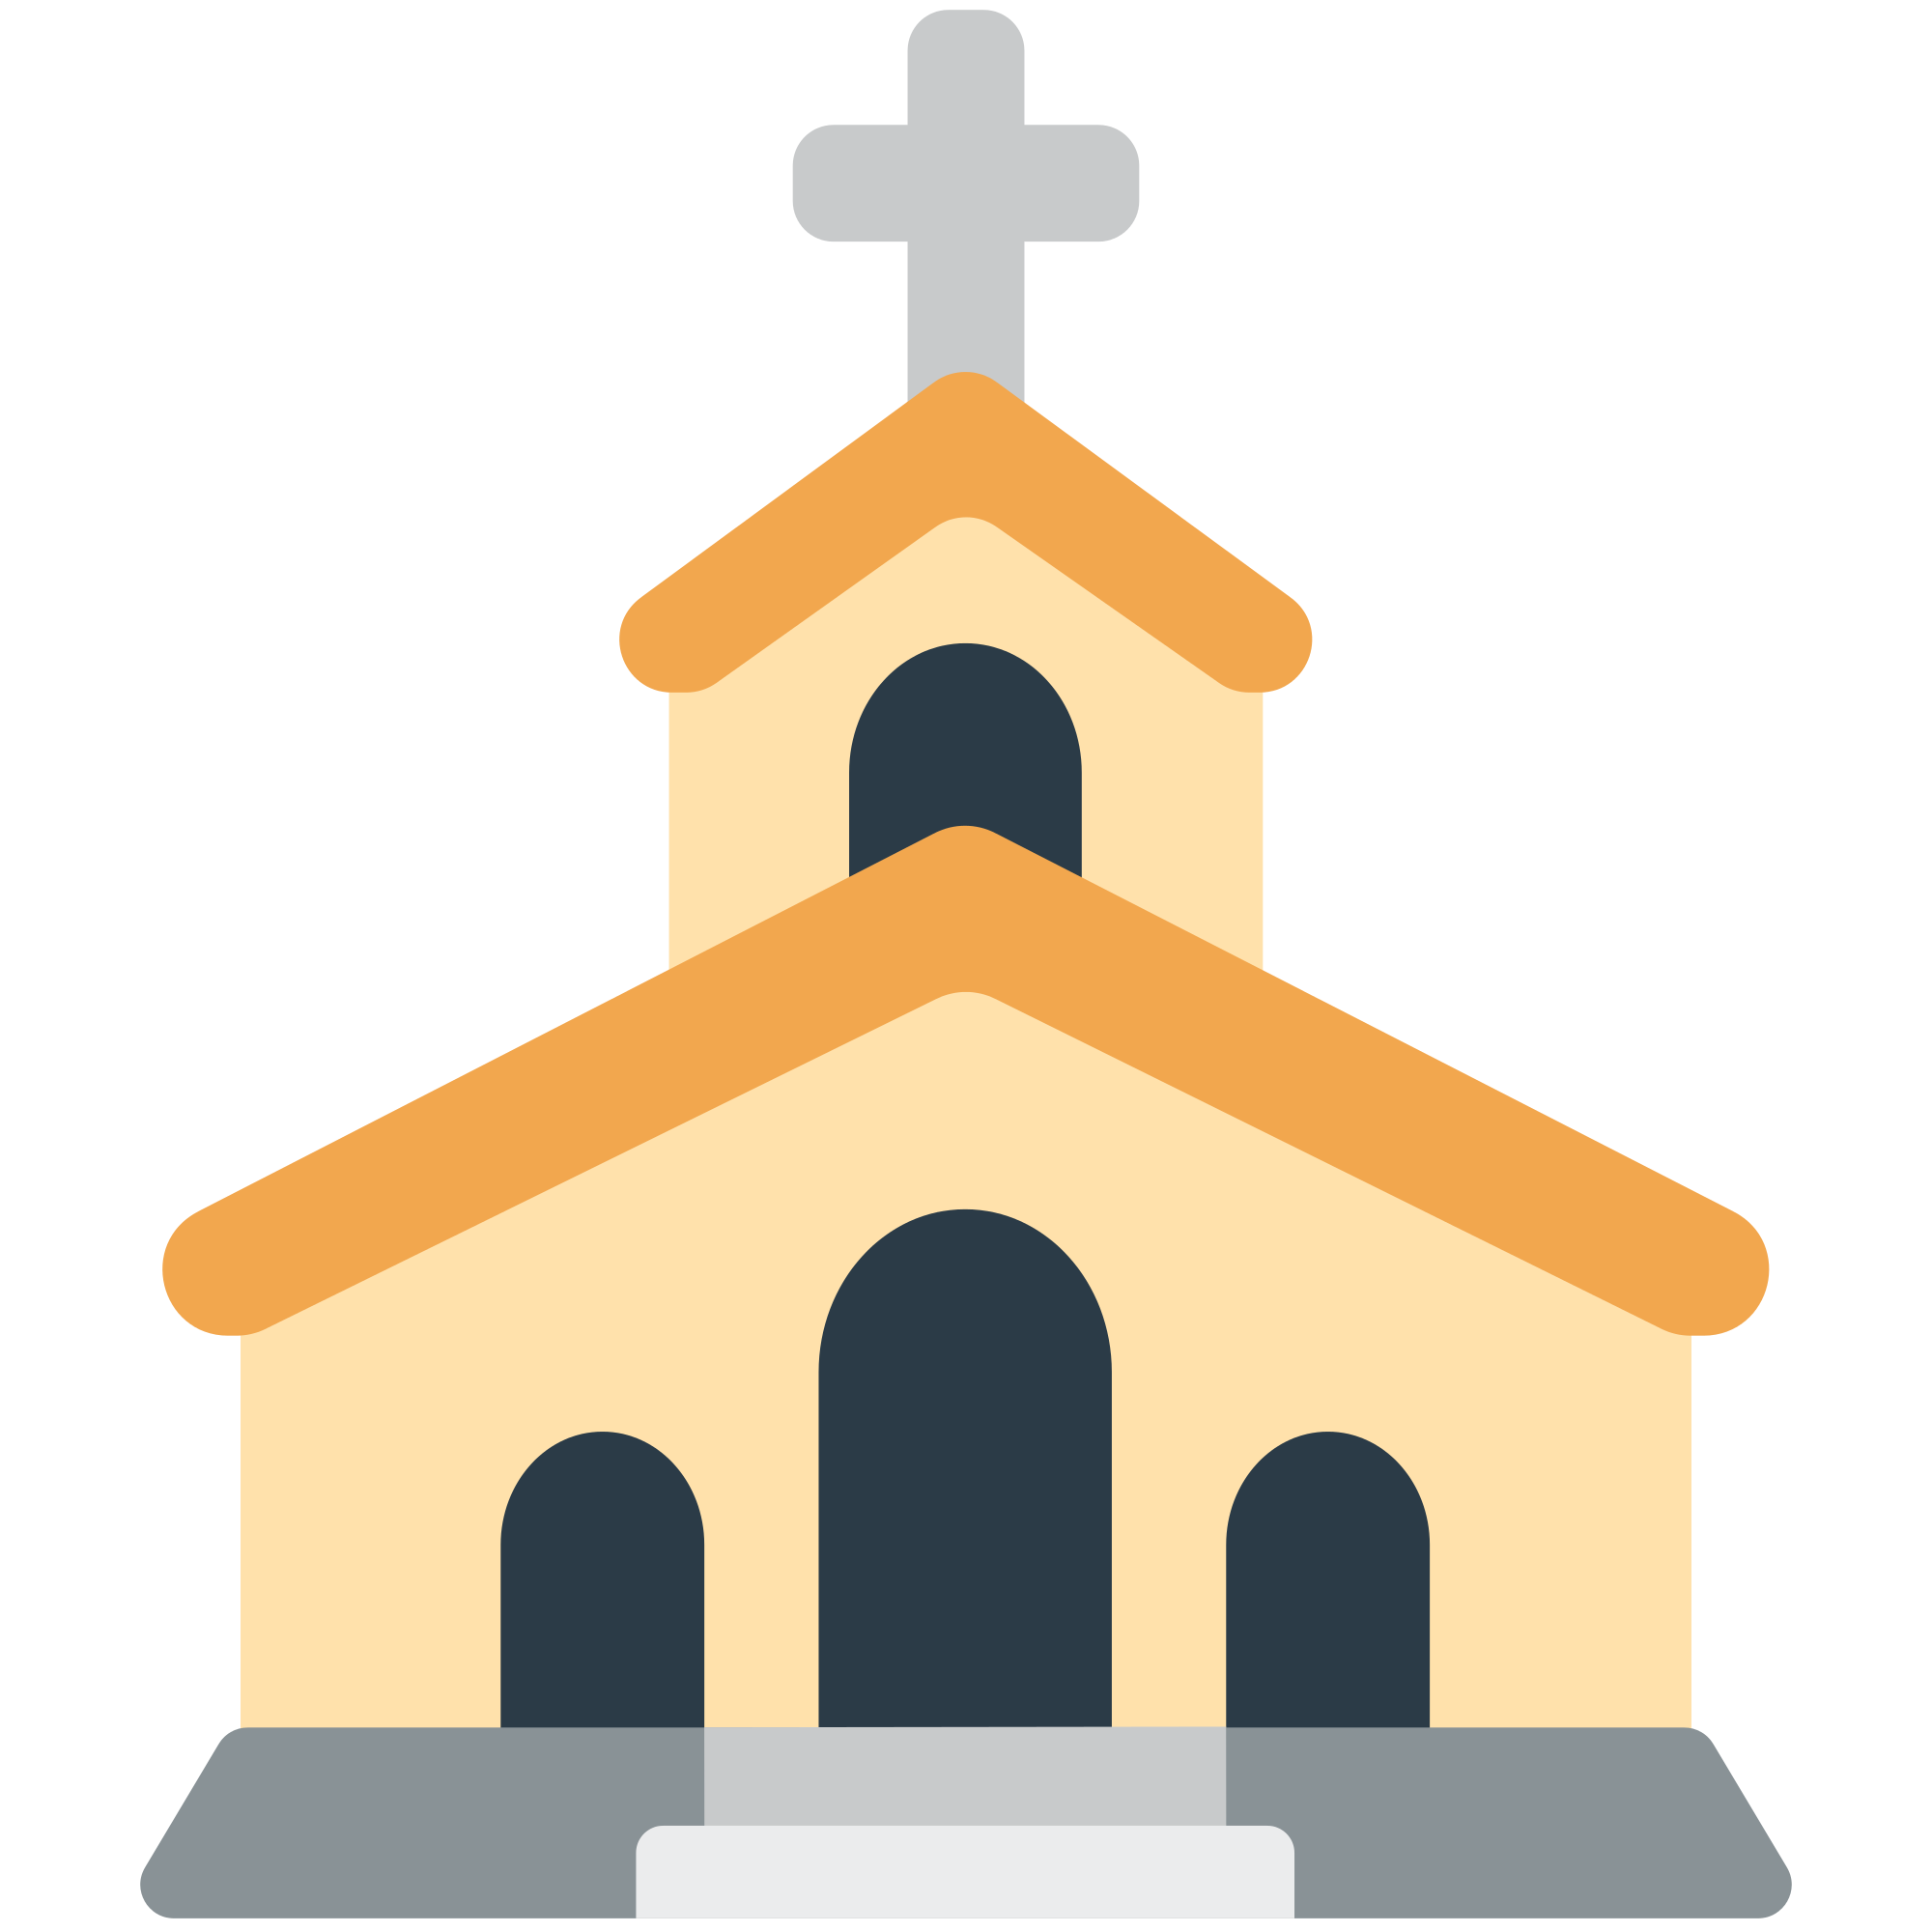 png royalty free stock Adobe clipart church mission. File fxemoji u ea